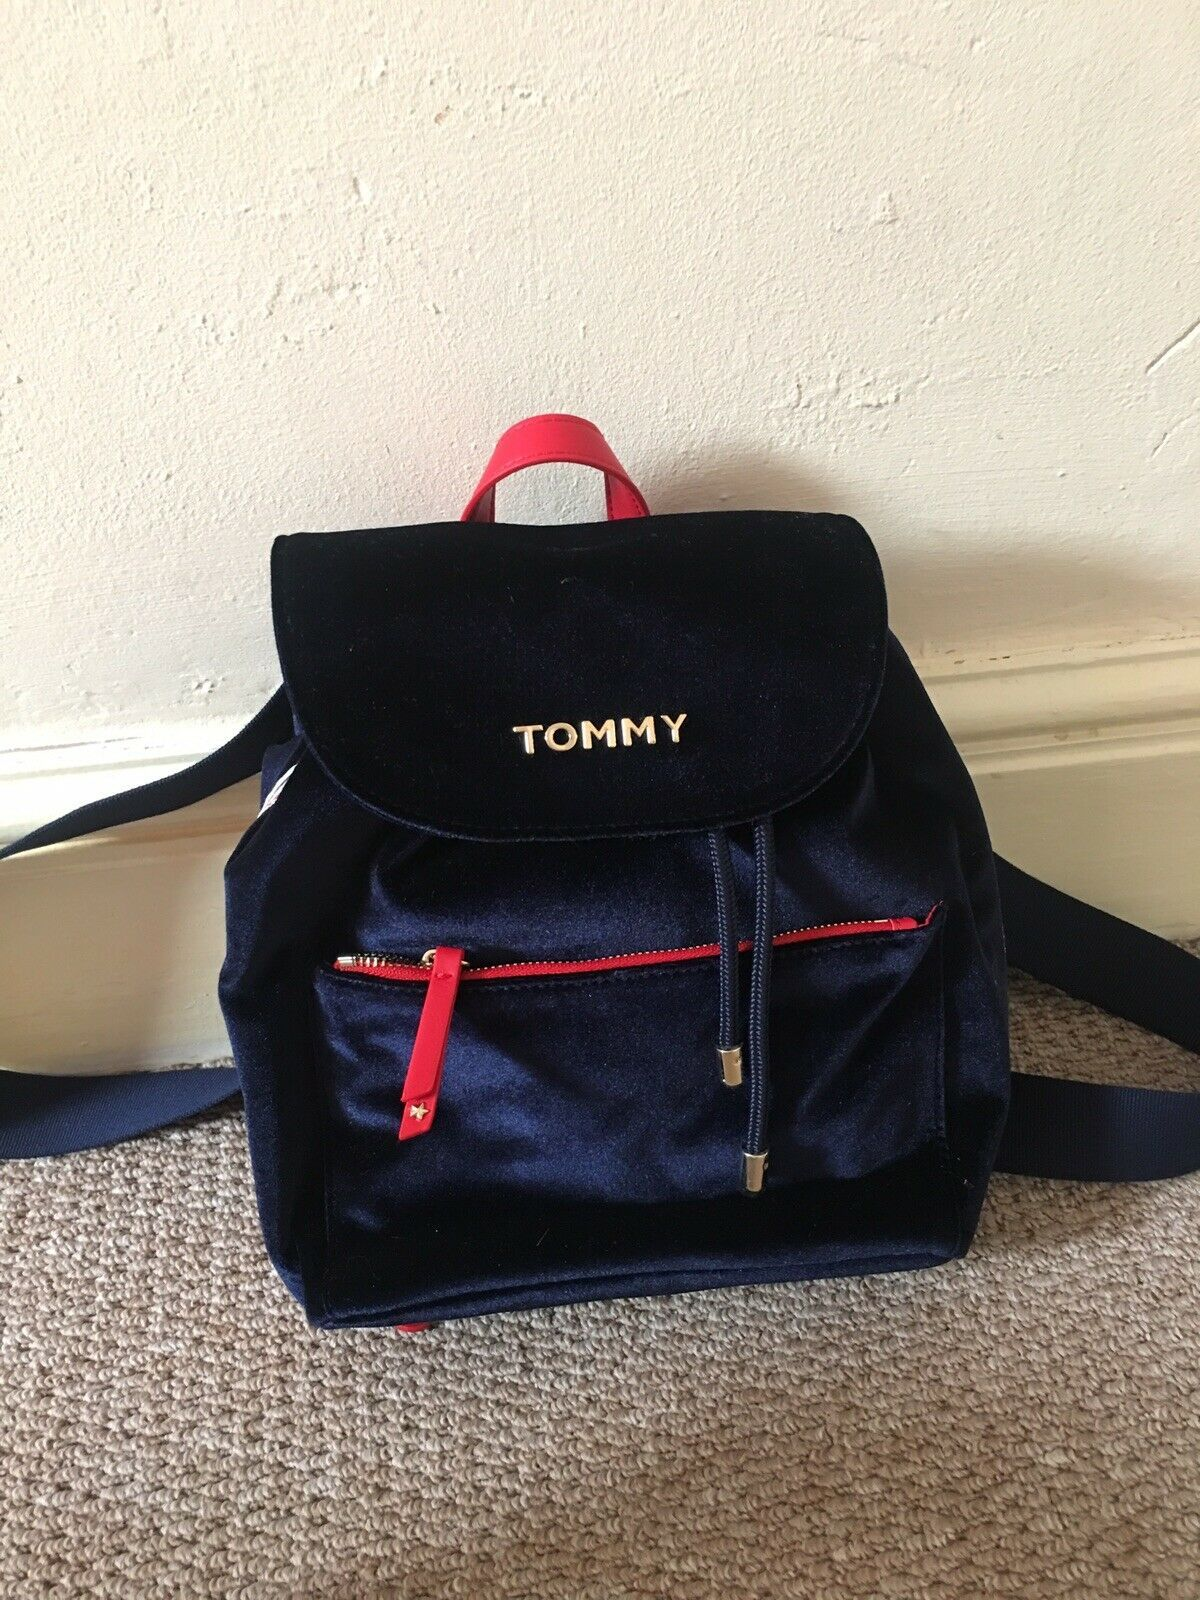 Ladies Tommy Hilfiger Bag Backpack Rucksack Ebay Tommy Hilfiger Bags Backpack Bags Tommy Hilfiger